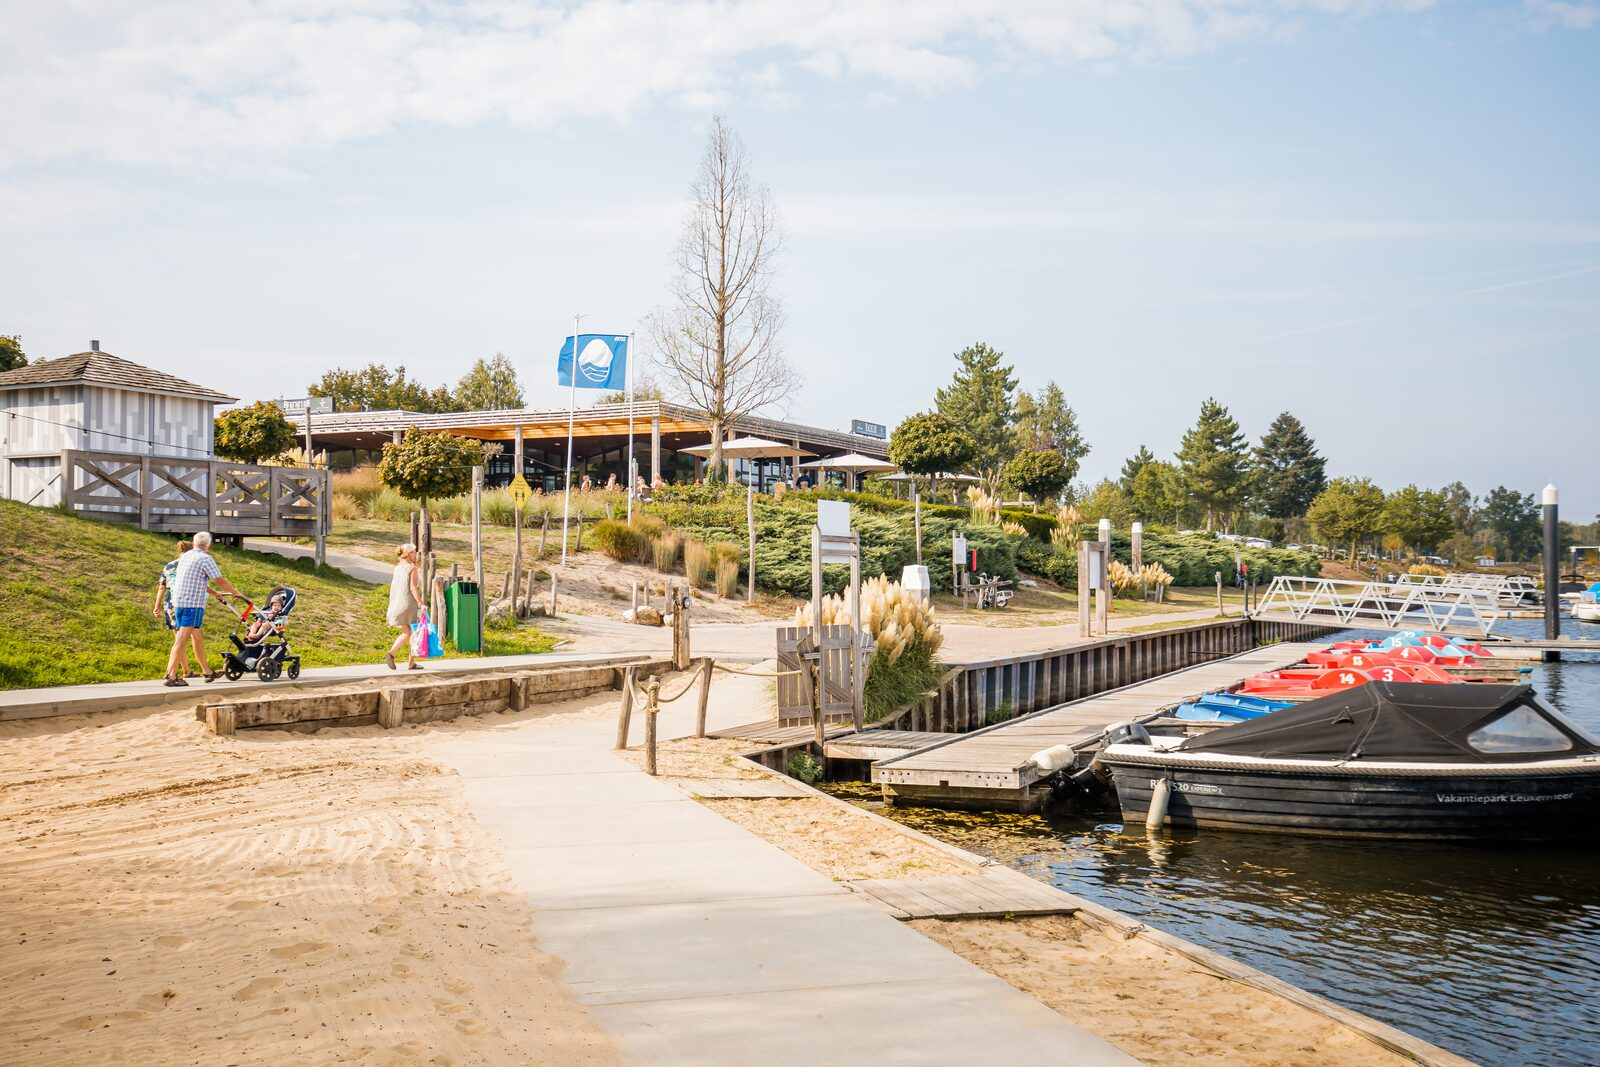 Camping met jachthaven